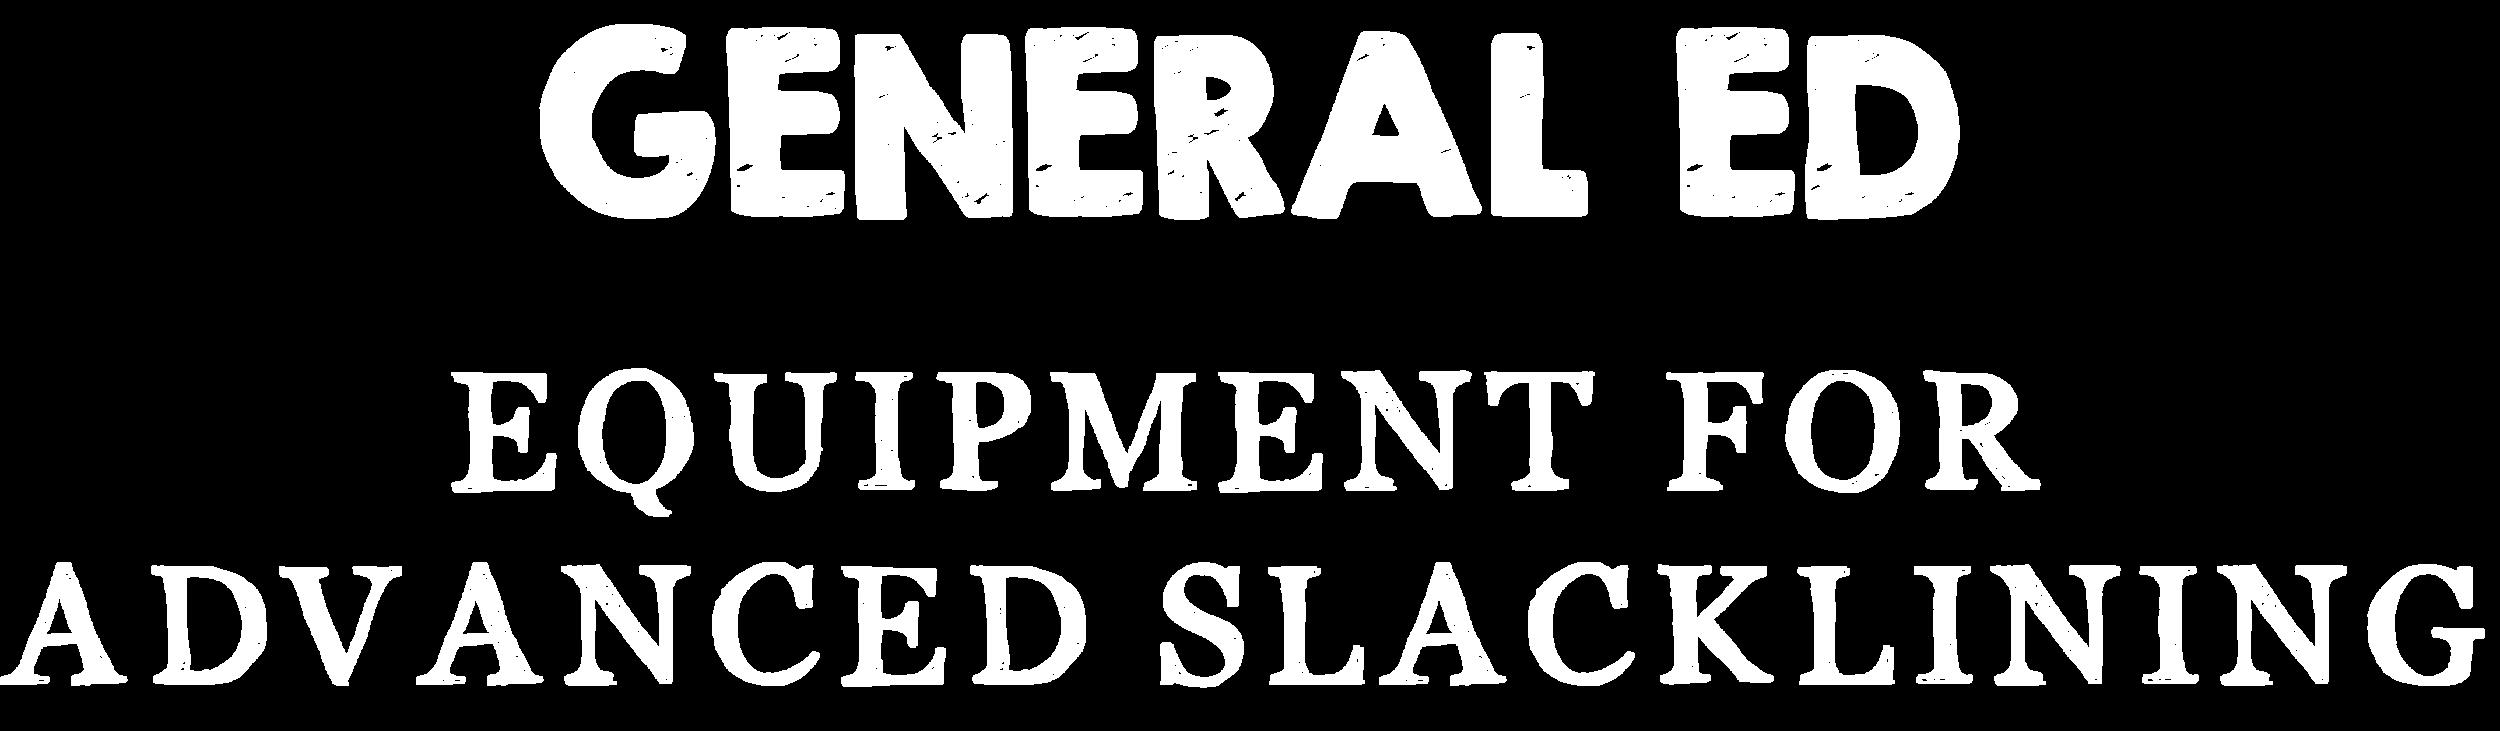 general ed equipment for advanced slacklining.png